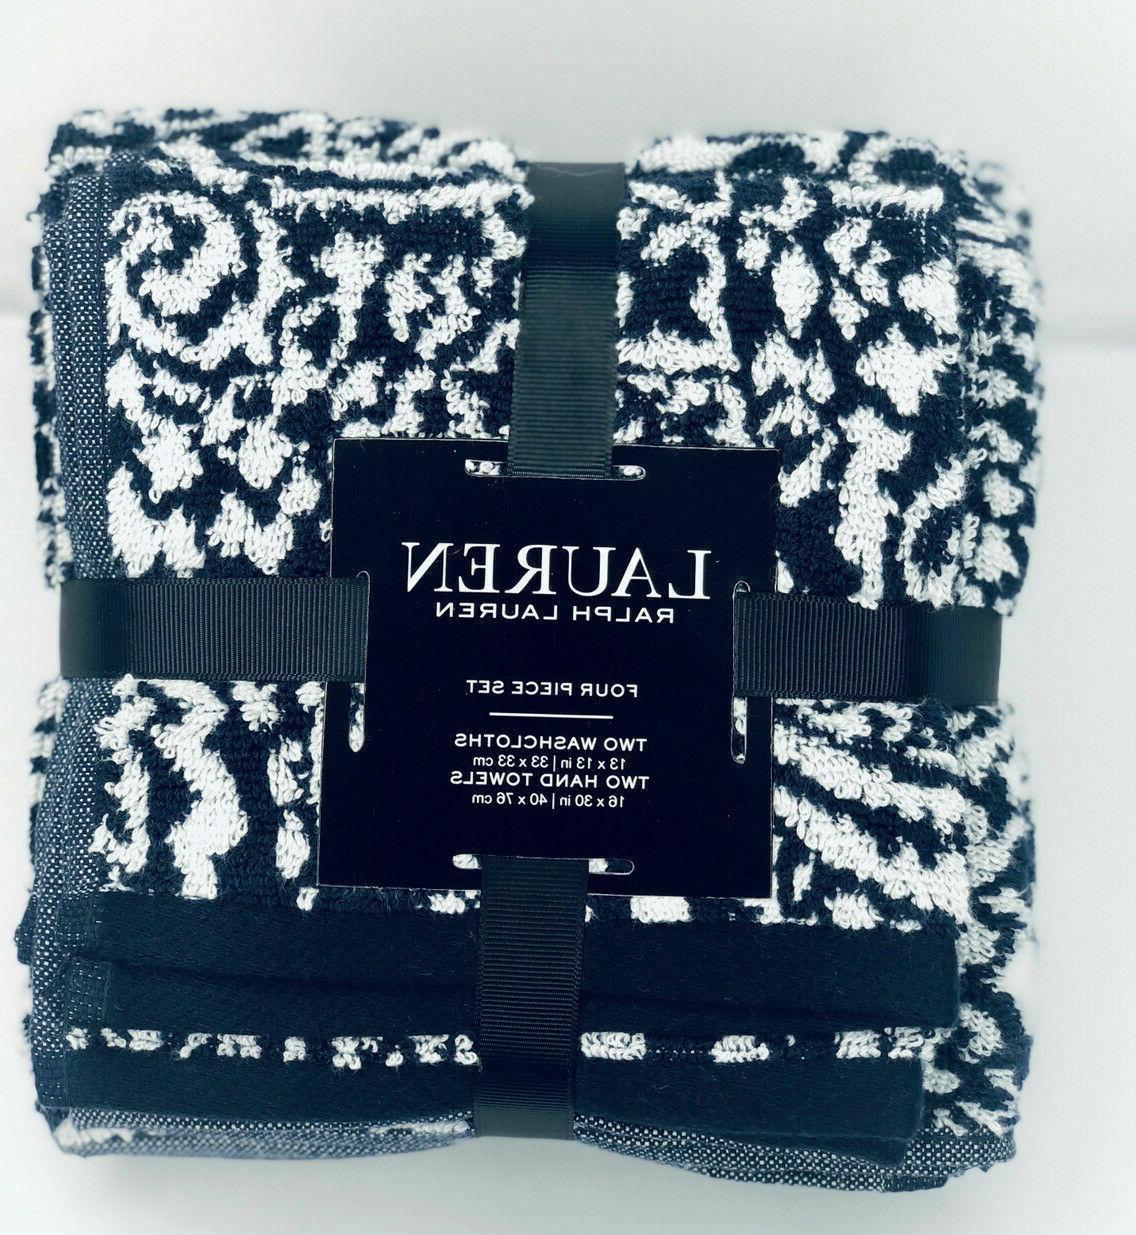 RALPH LAUREN Piece Towel Towels Washcloths cotton